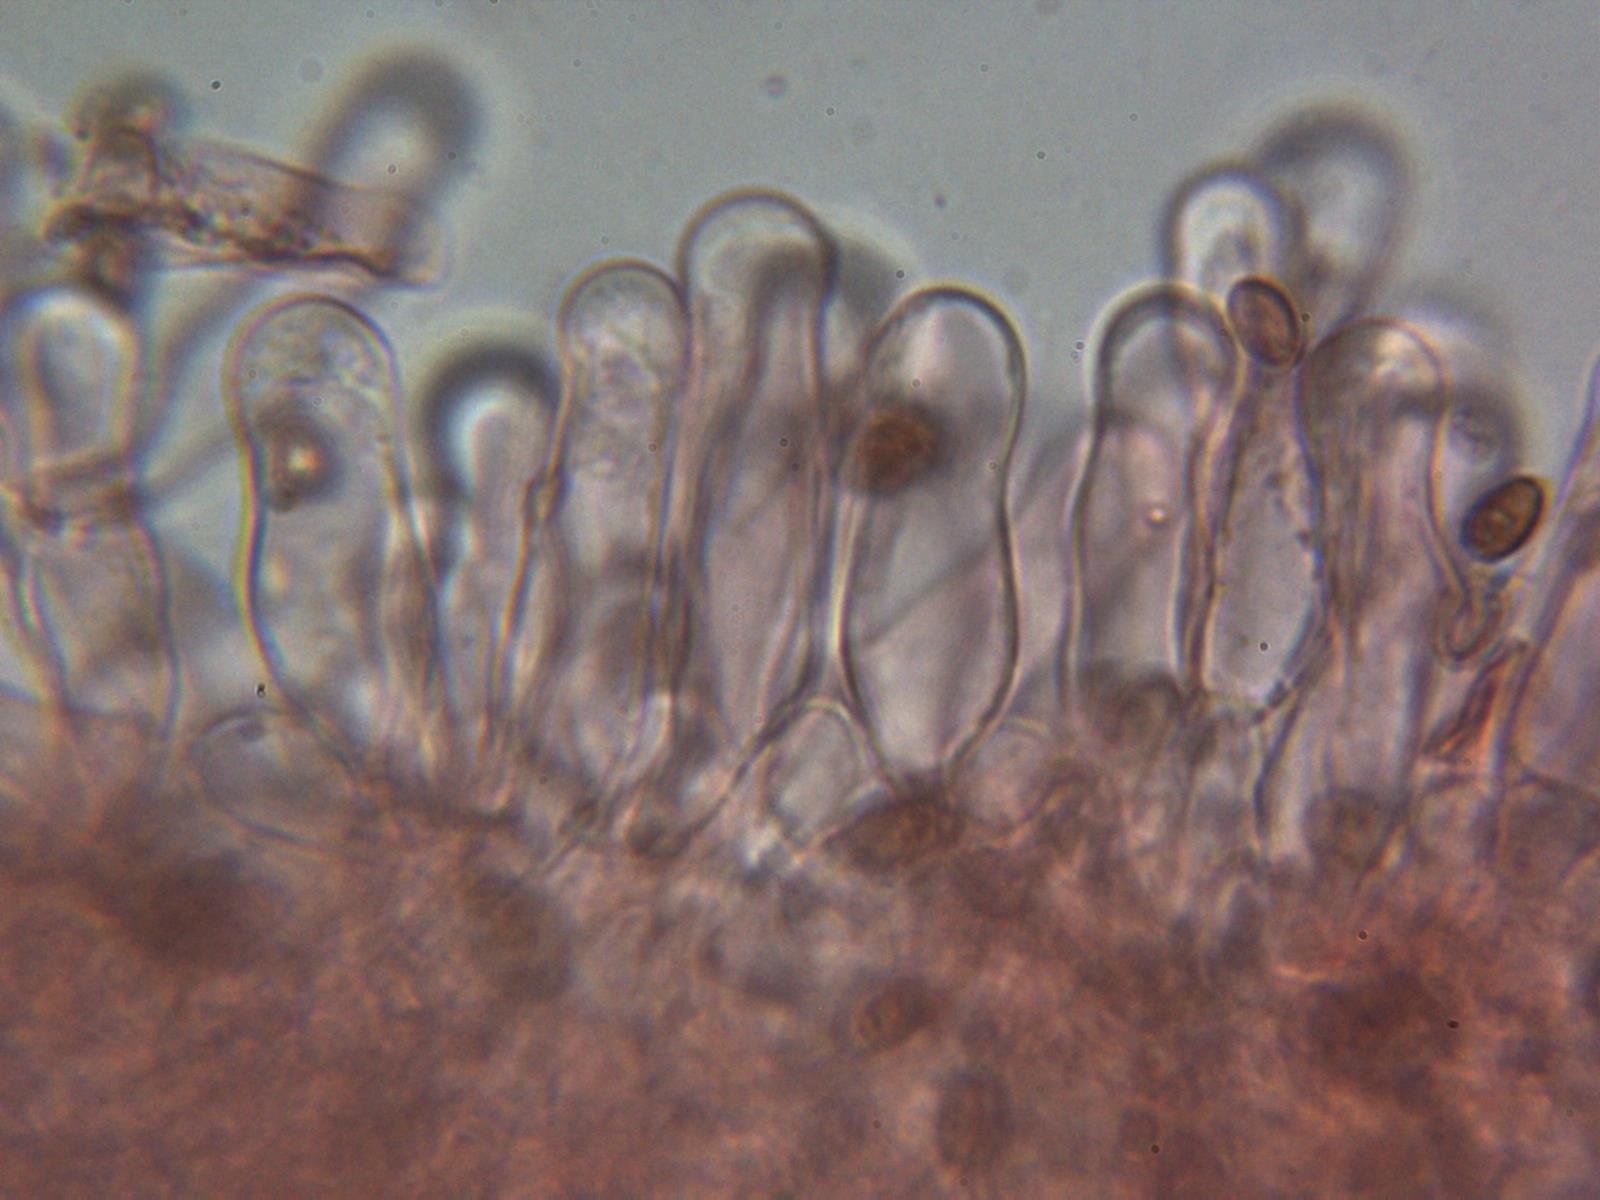 Queilocistidios2_2020-10-03.jpg